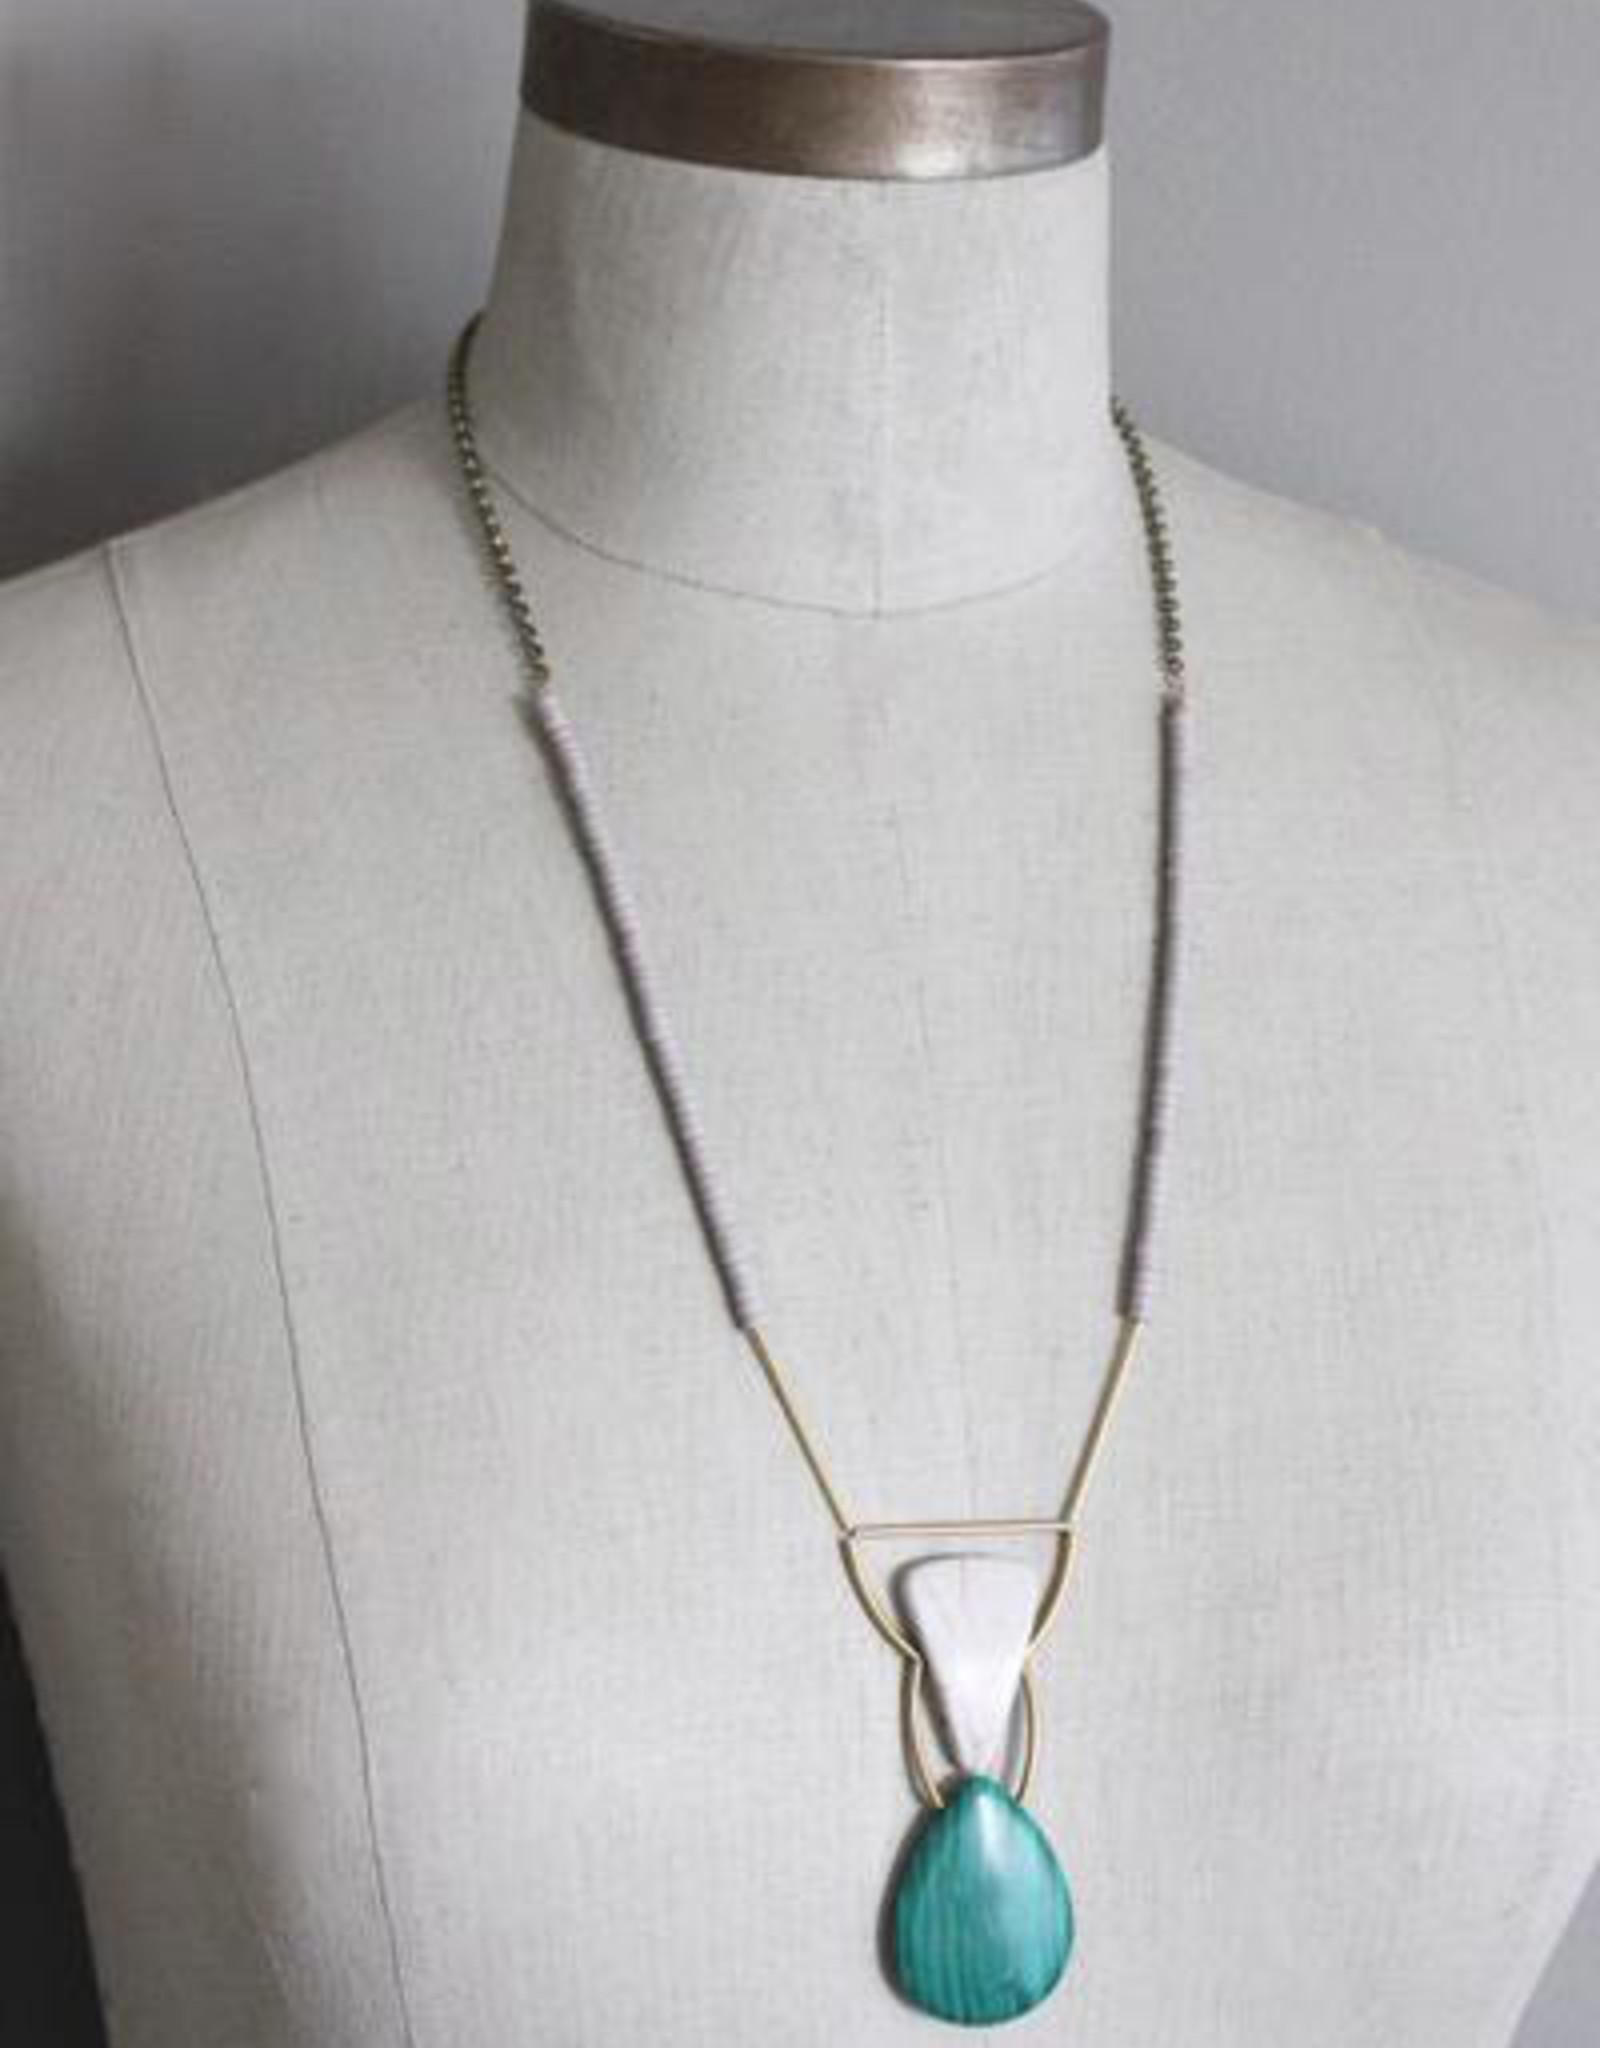 David Aubrey Malachite Teardrop, White Agate, and Brass Necklace - David Aubrey